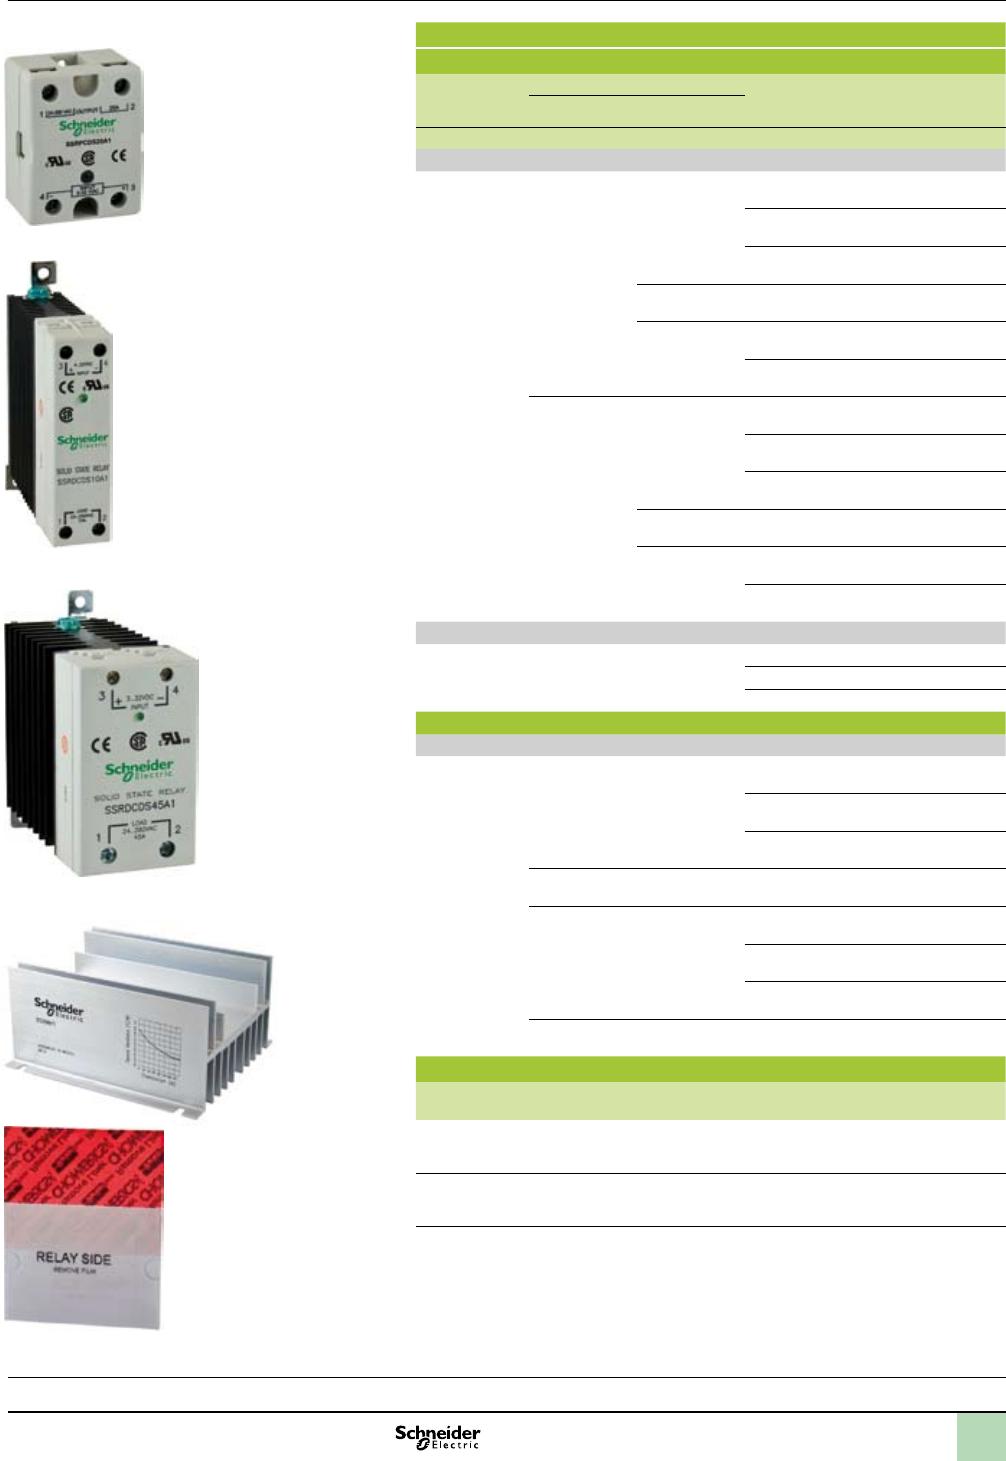 Schneider Electric Zelio Relays Catalog 336277 New Zelior Solidstate 2